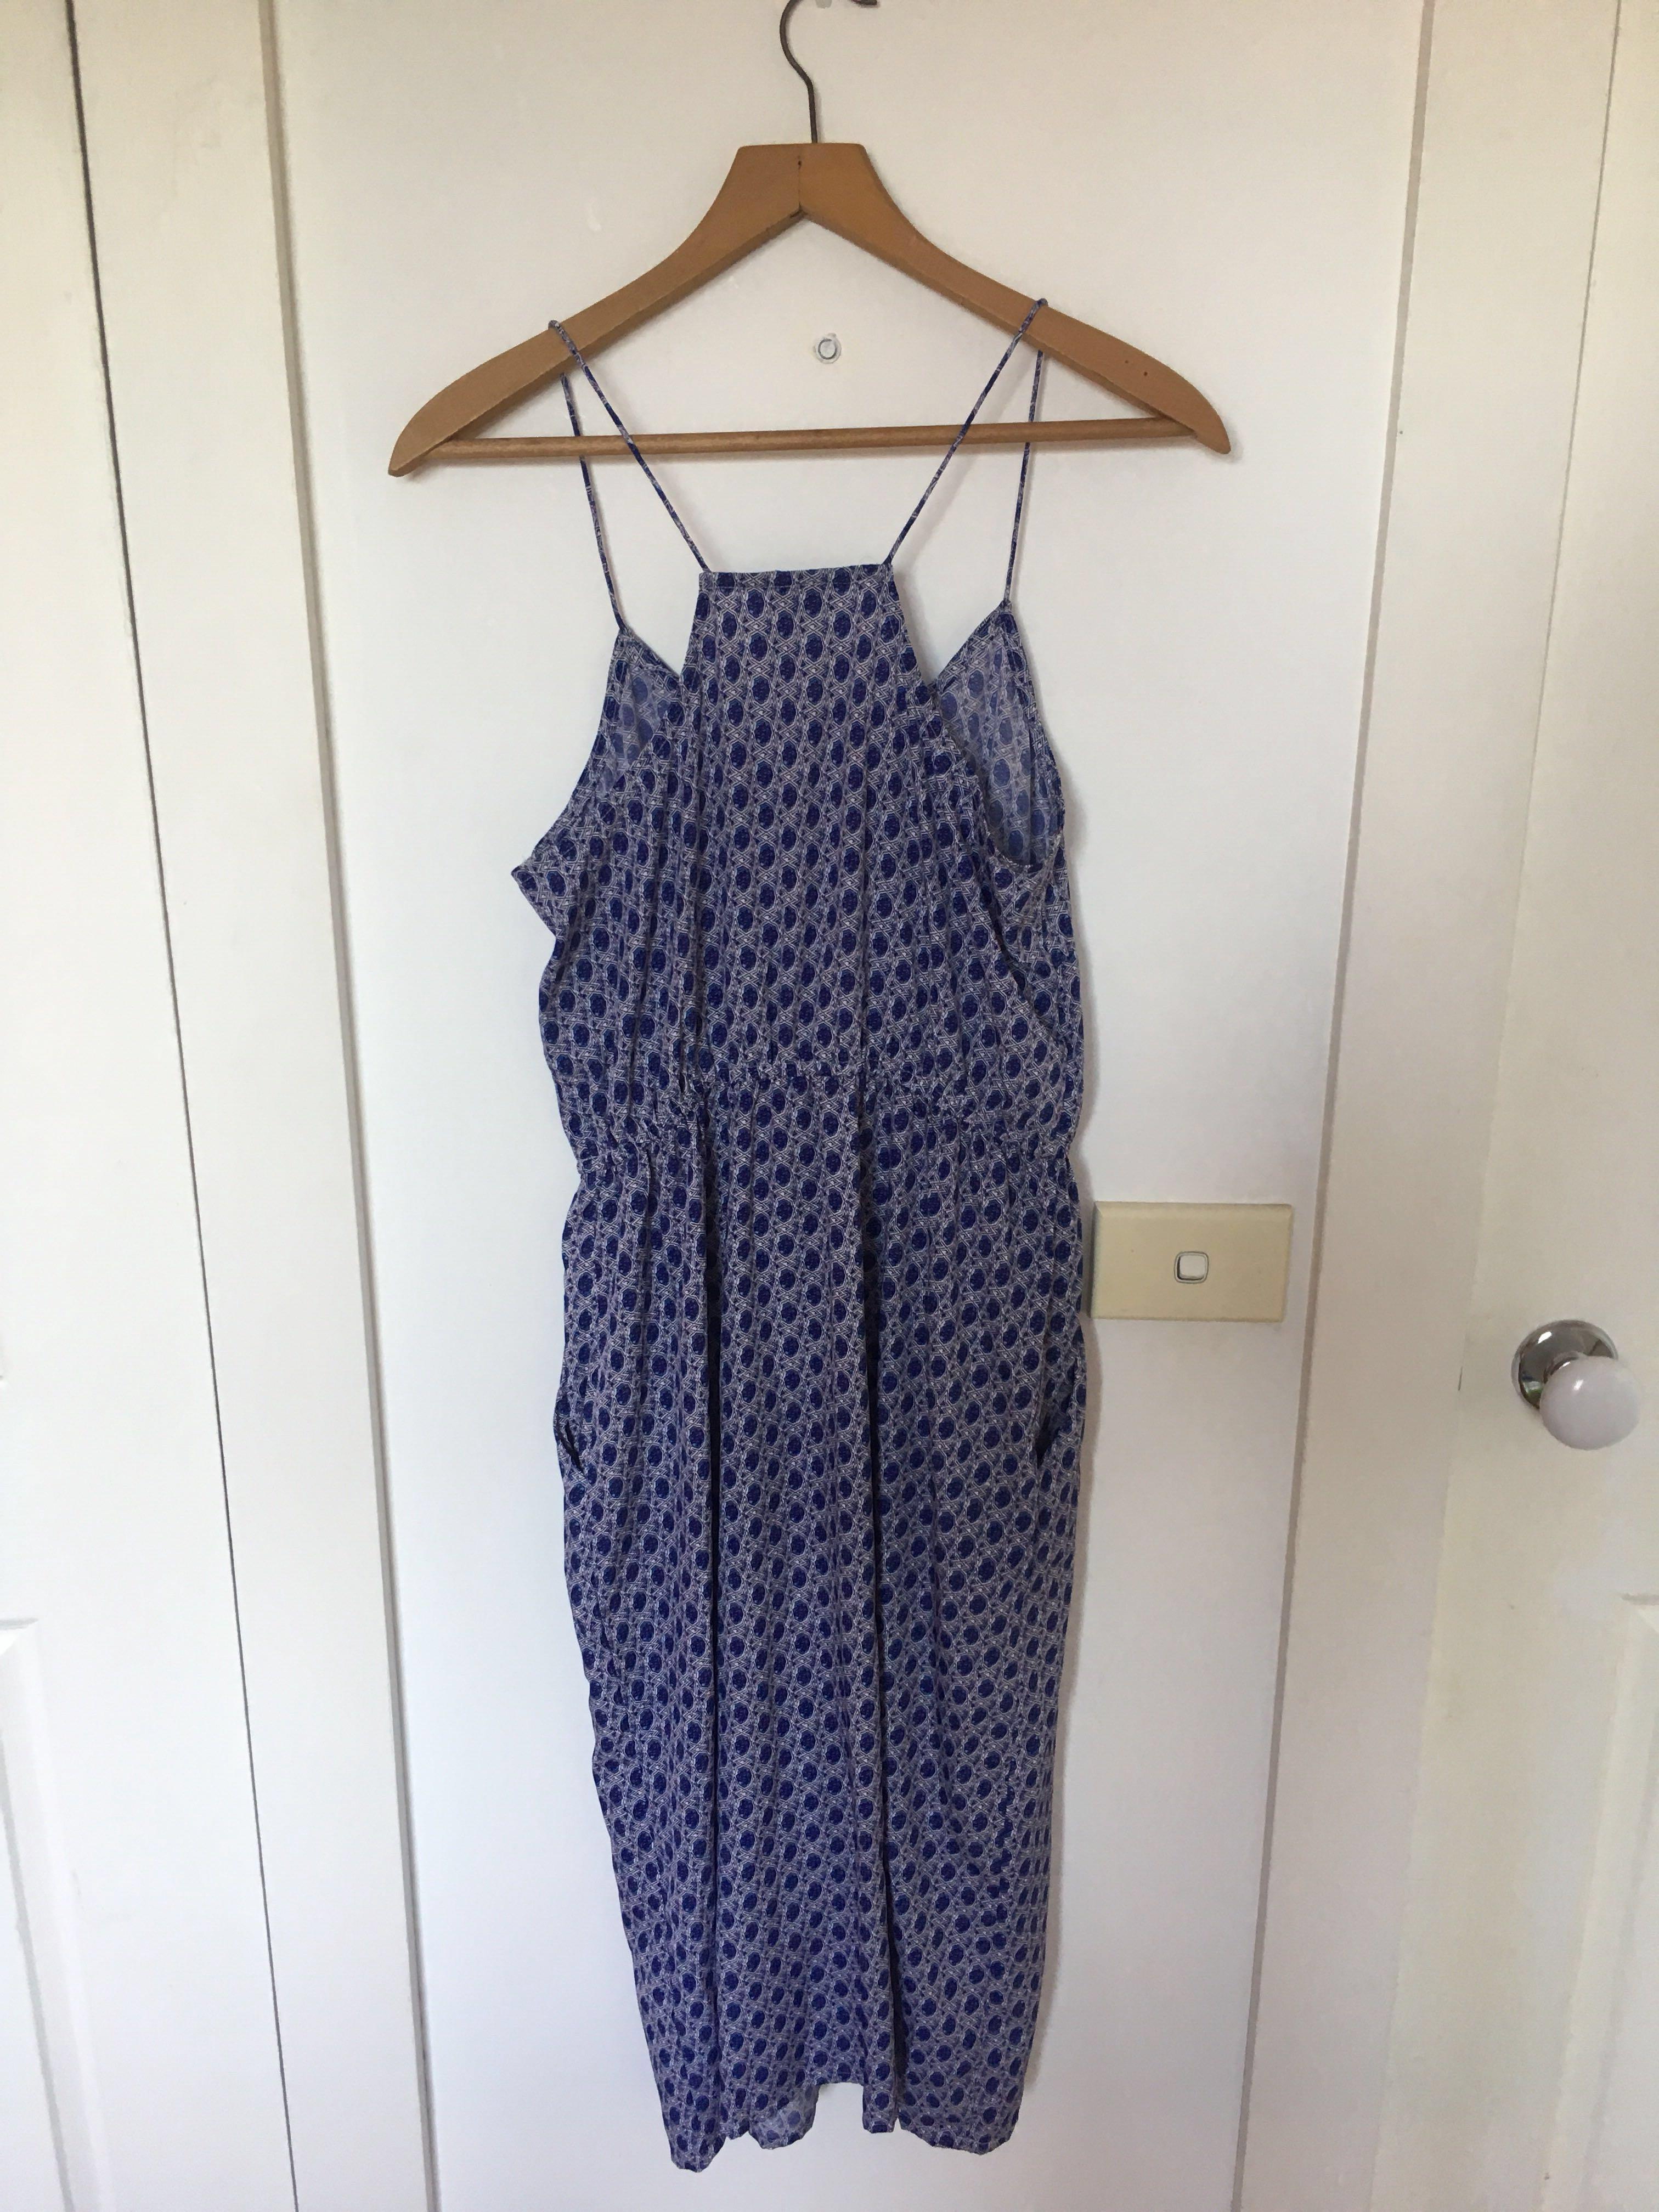 H&M blue racerback patterned midi dress (with pockets)